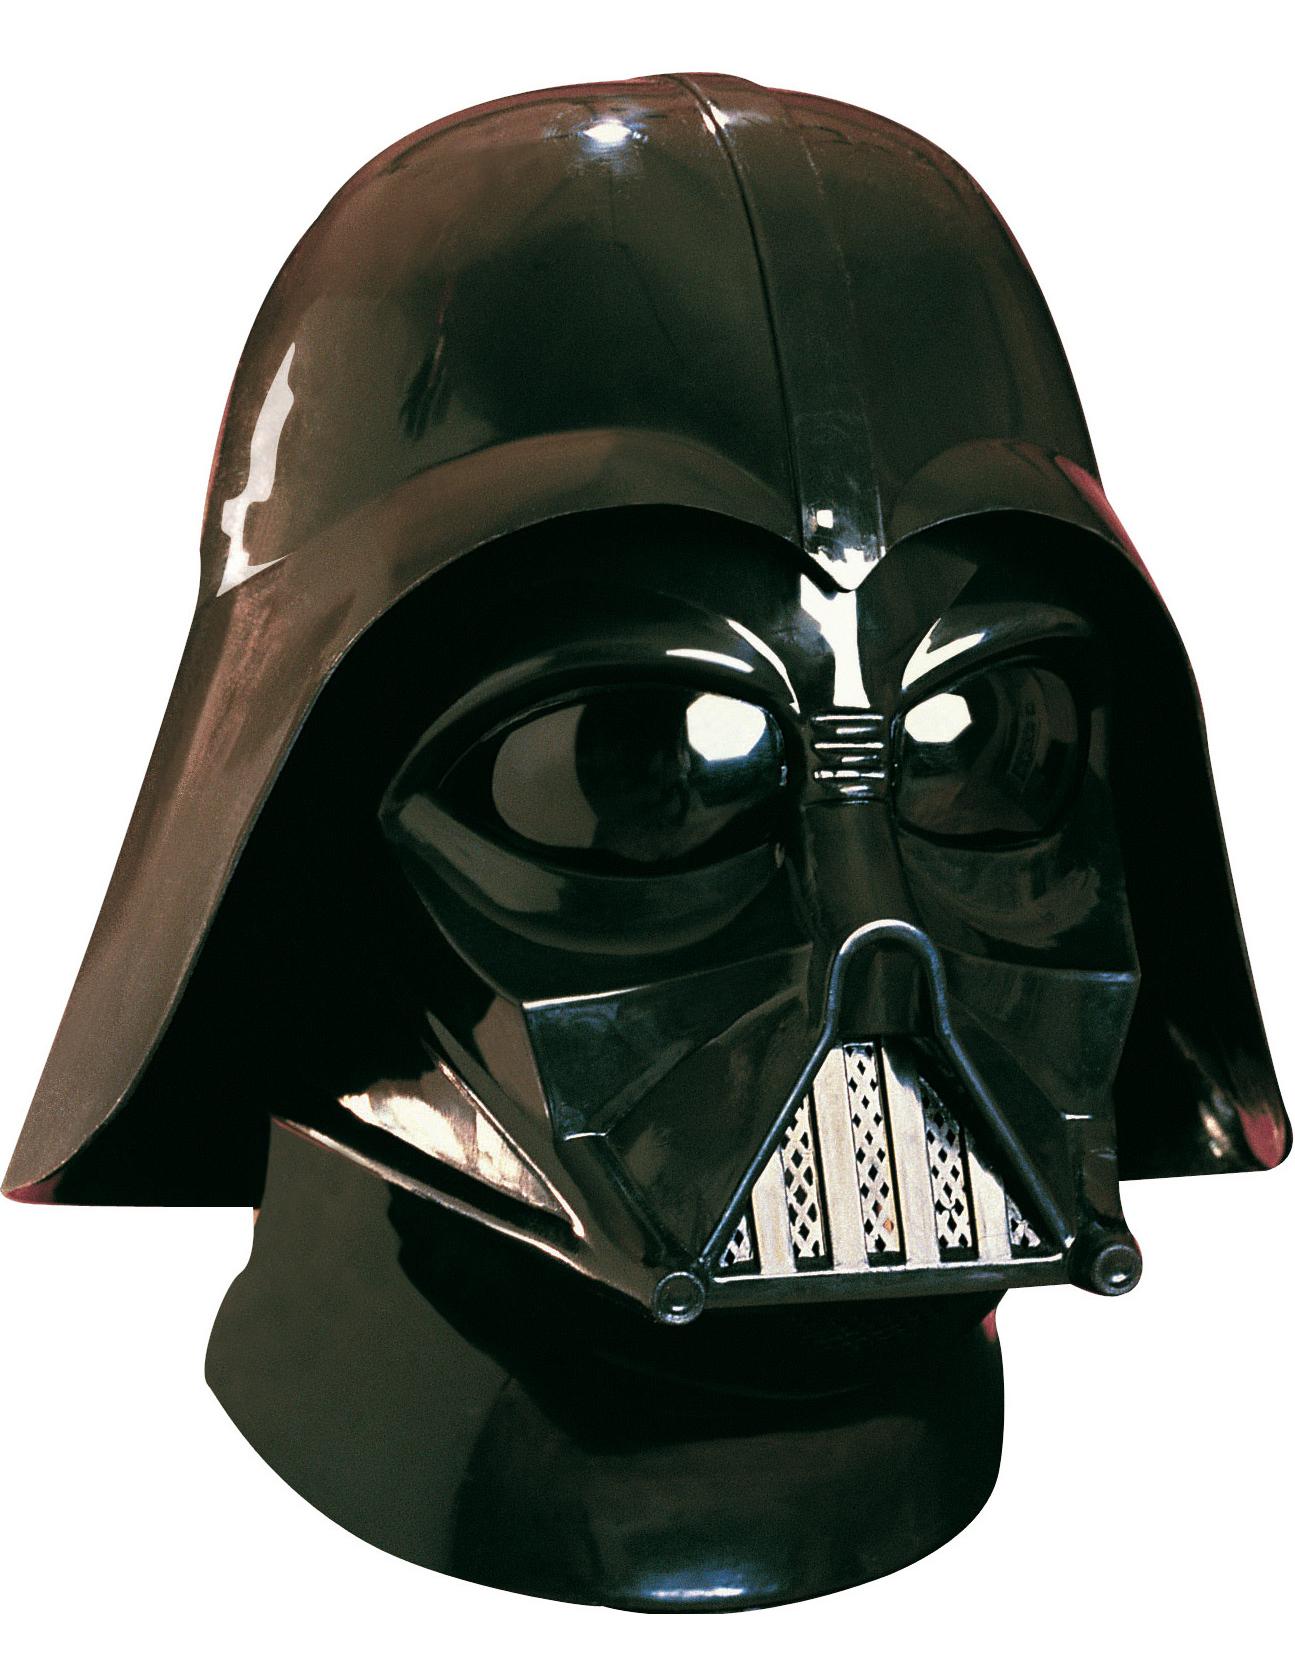 Kit masque et casque dark vador adute star wars deguise toi achat de masques - Visage de dark vador ...